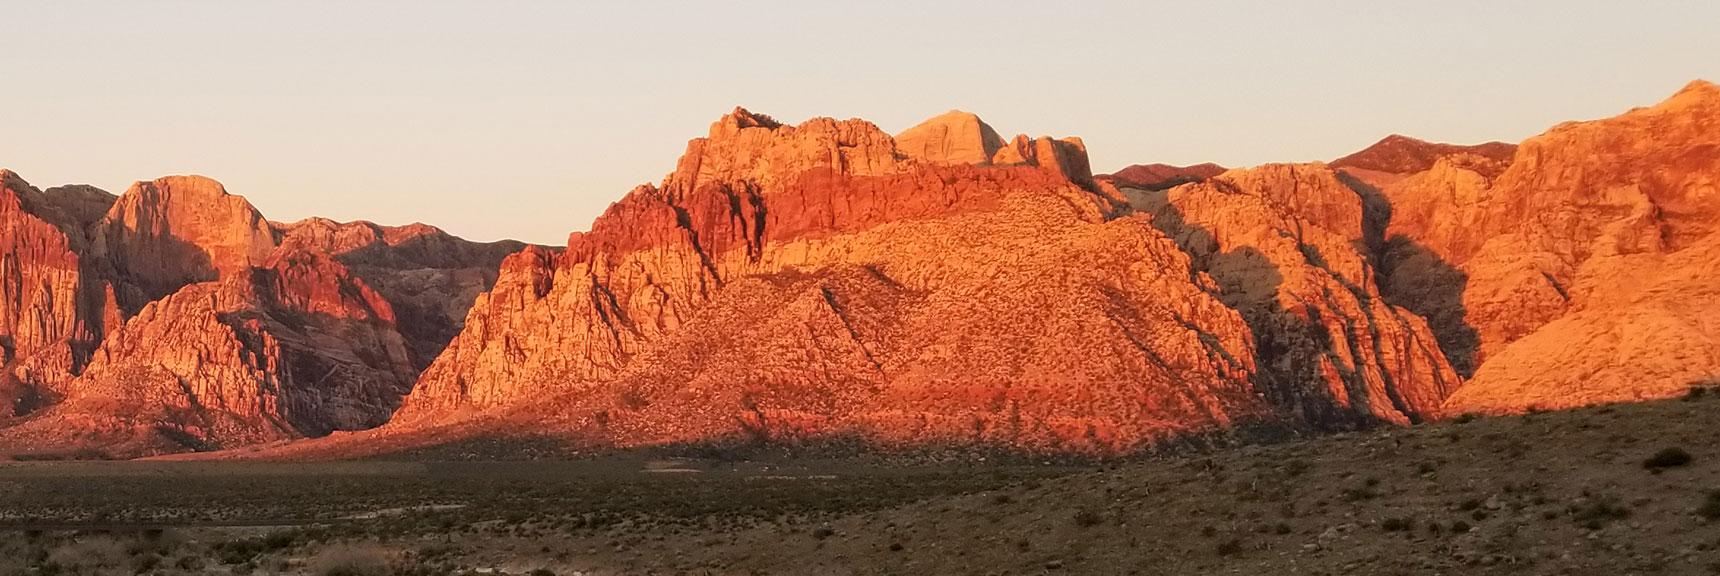 Bridge Mountain Viewed from Turtlehead Peak Saddle, Red Rock National Park, Nevada